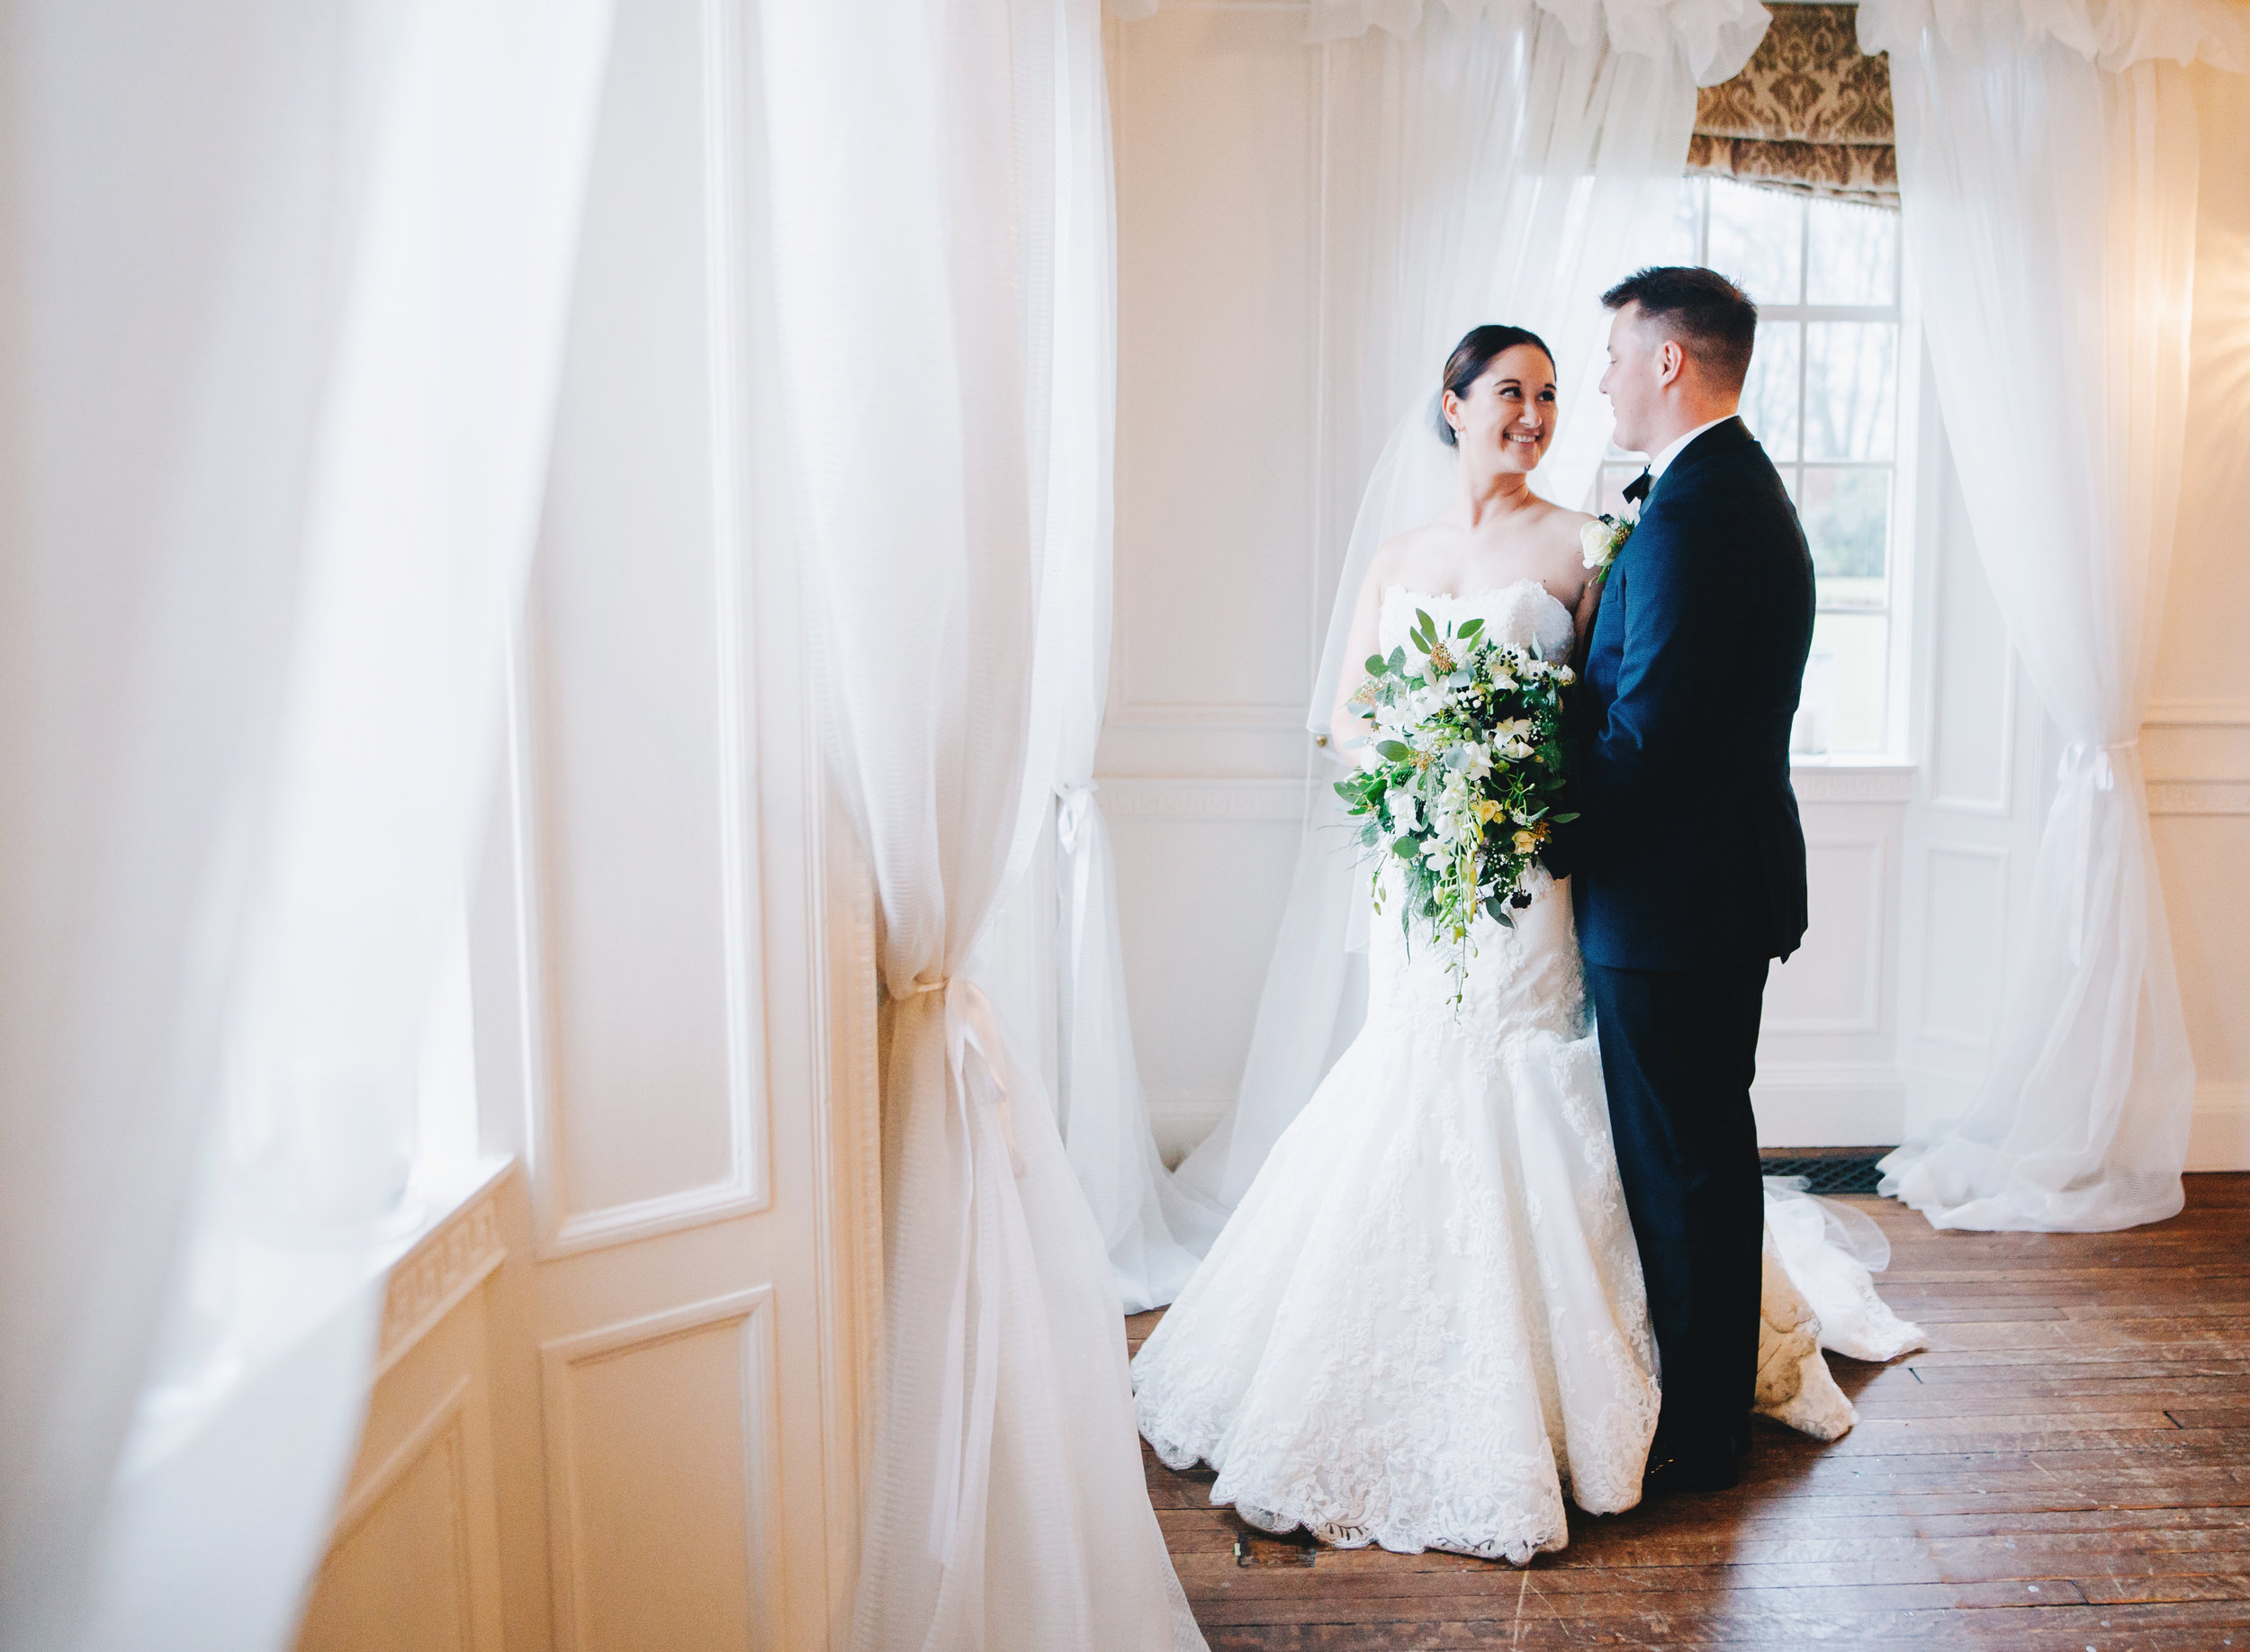 interior of Eaves Hall wedding venue